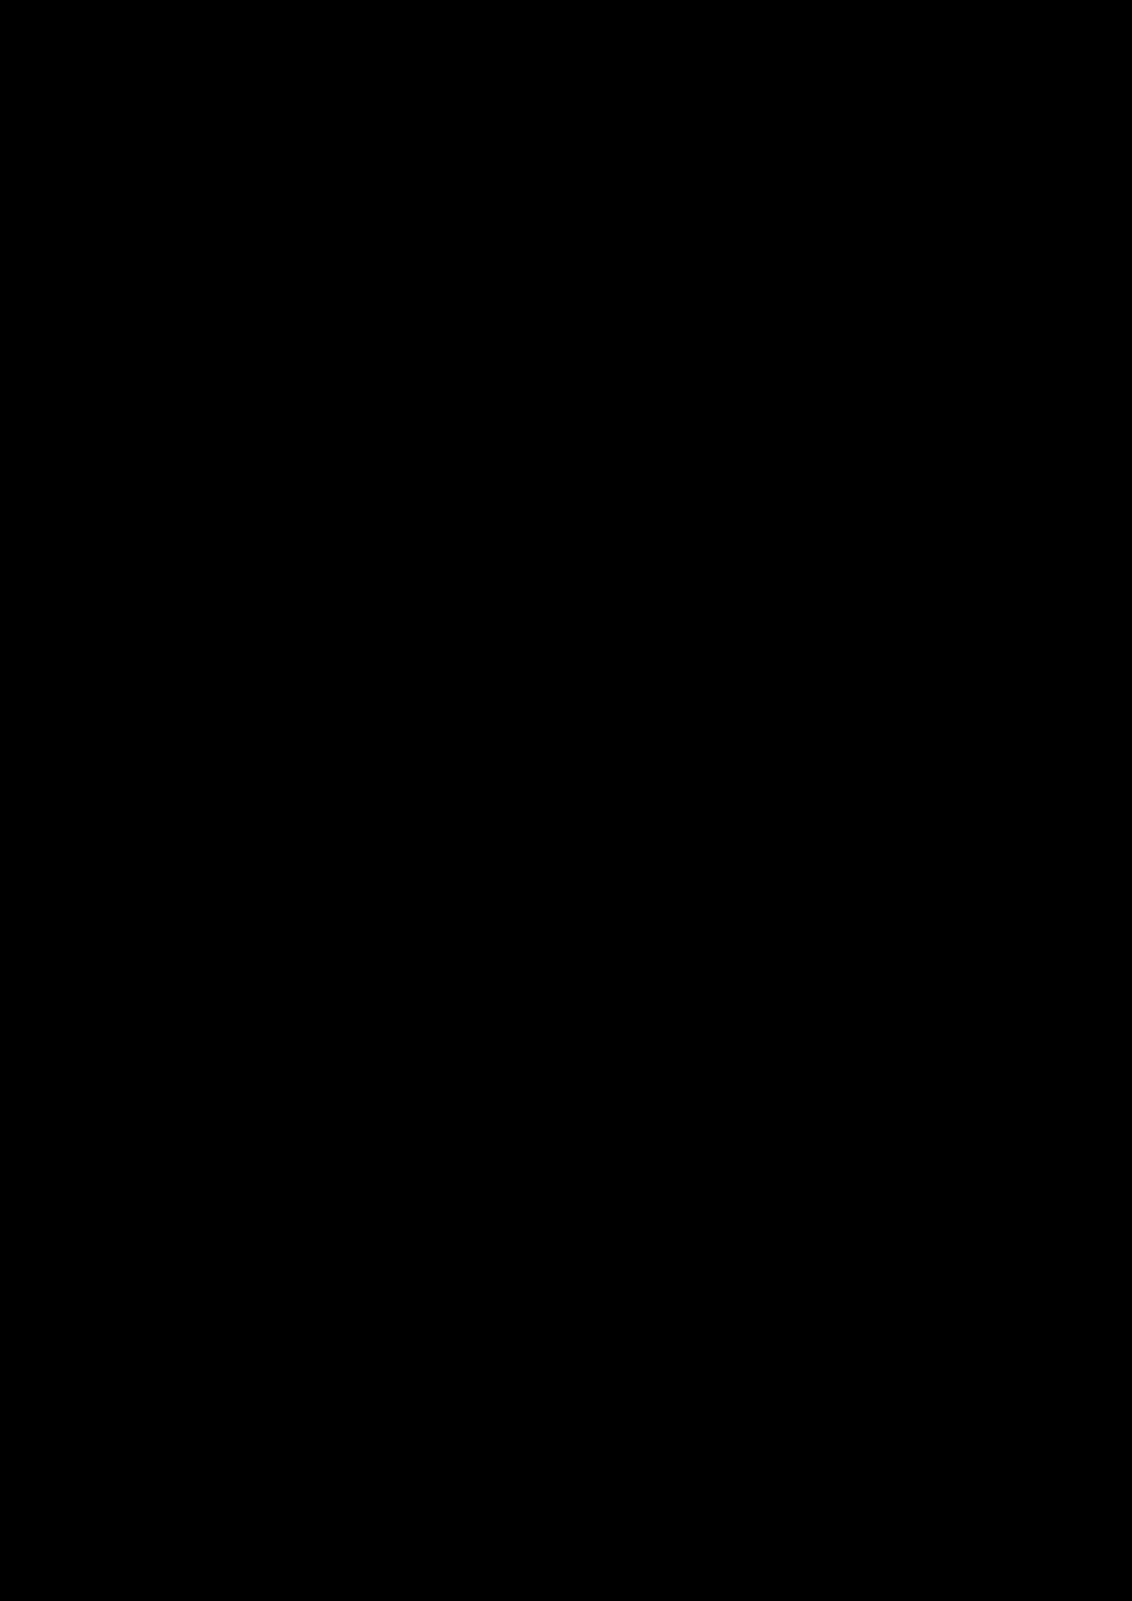 Belyiy sokol slide, Image 92